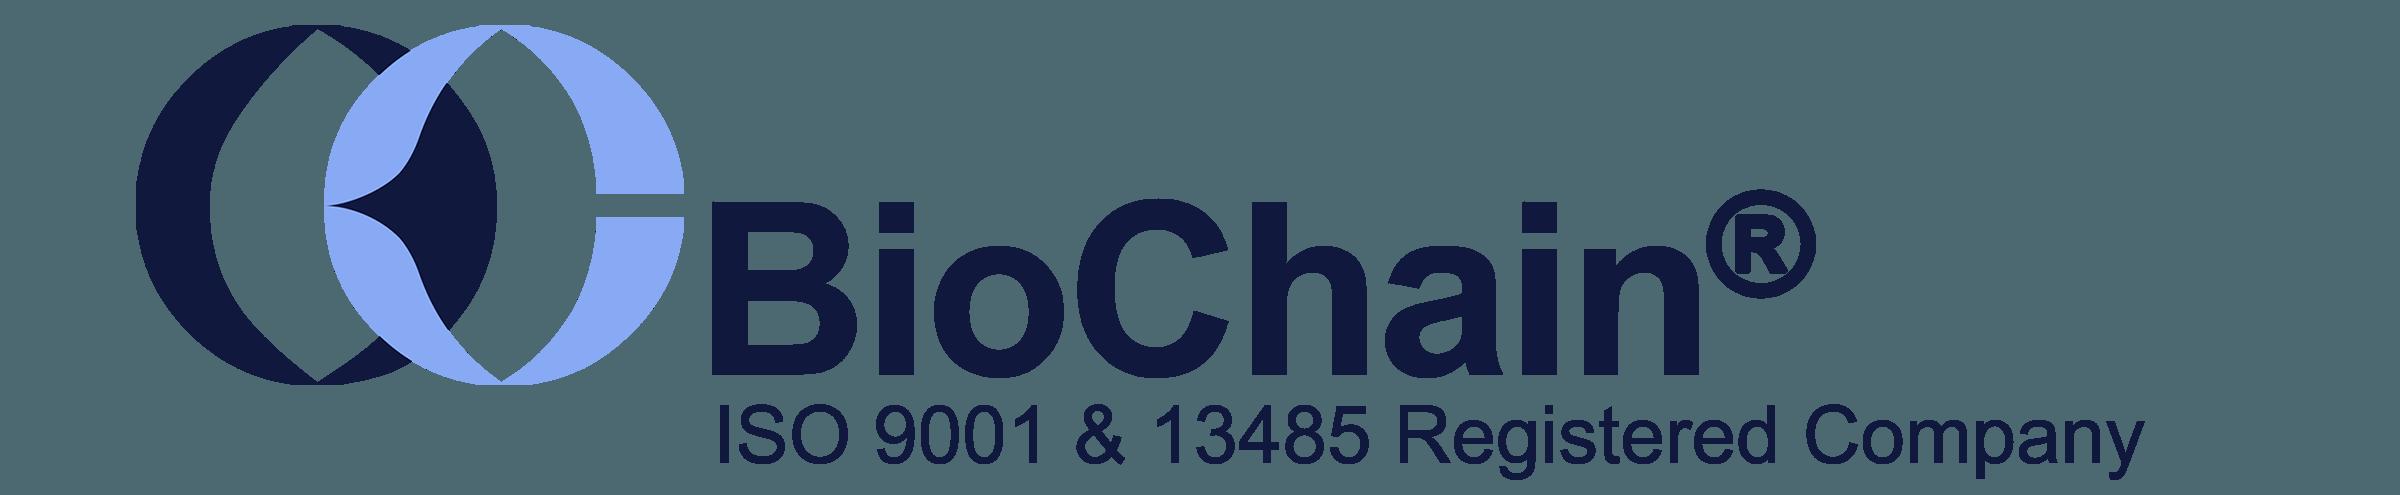 Biochain